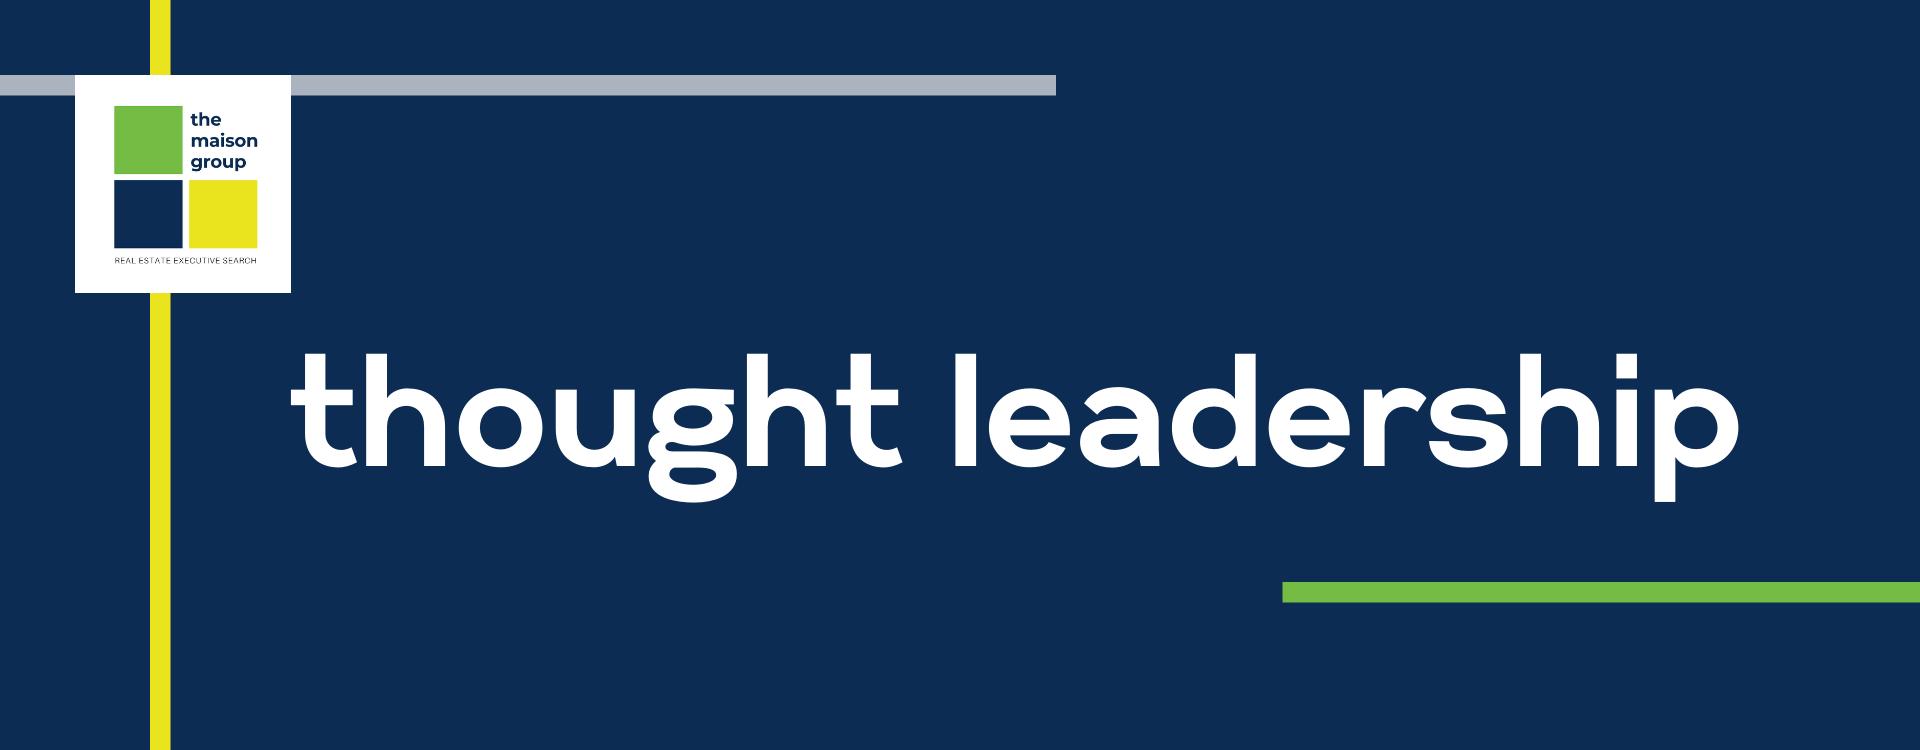 TMG Thought Leadership